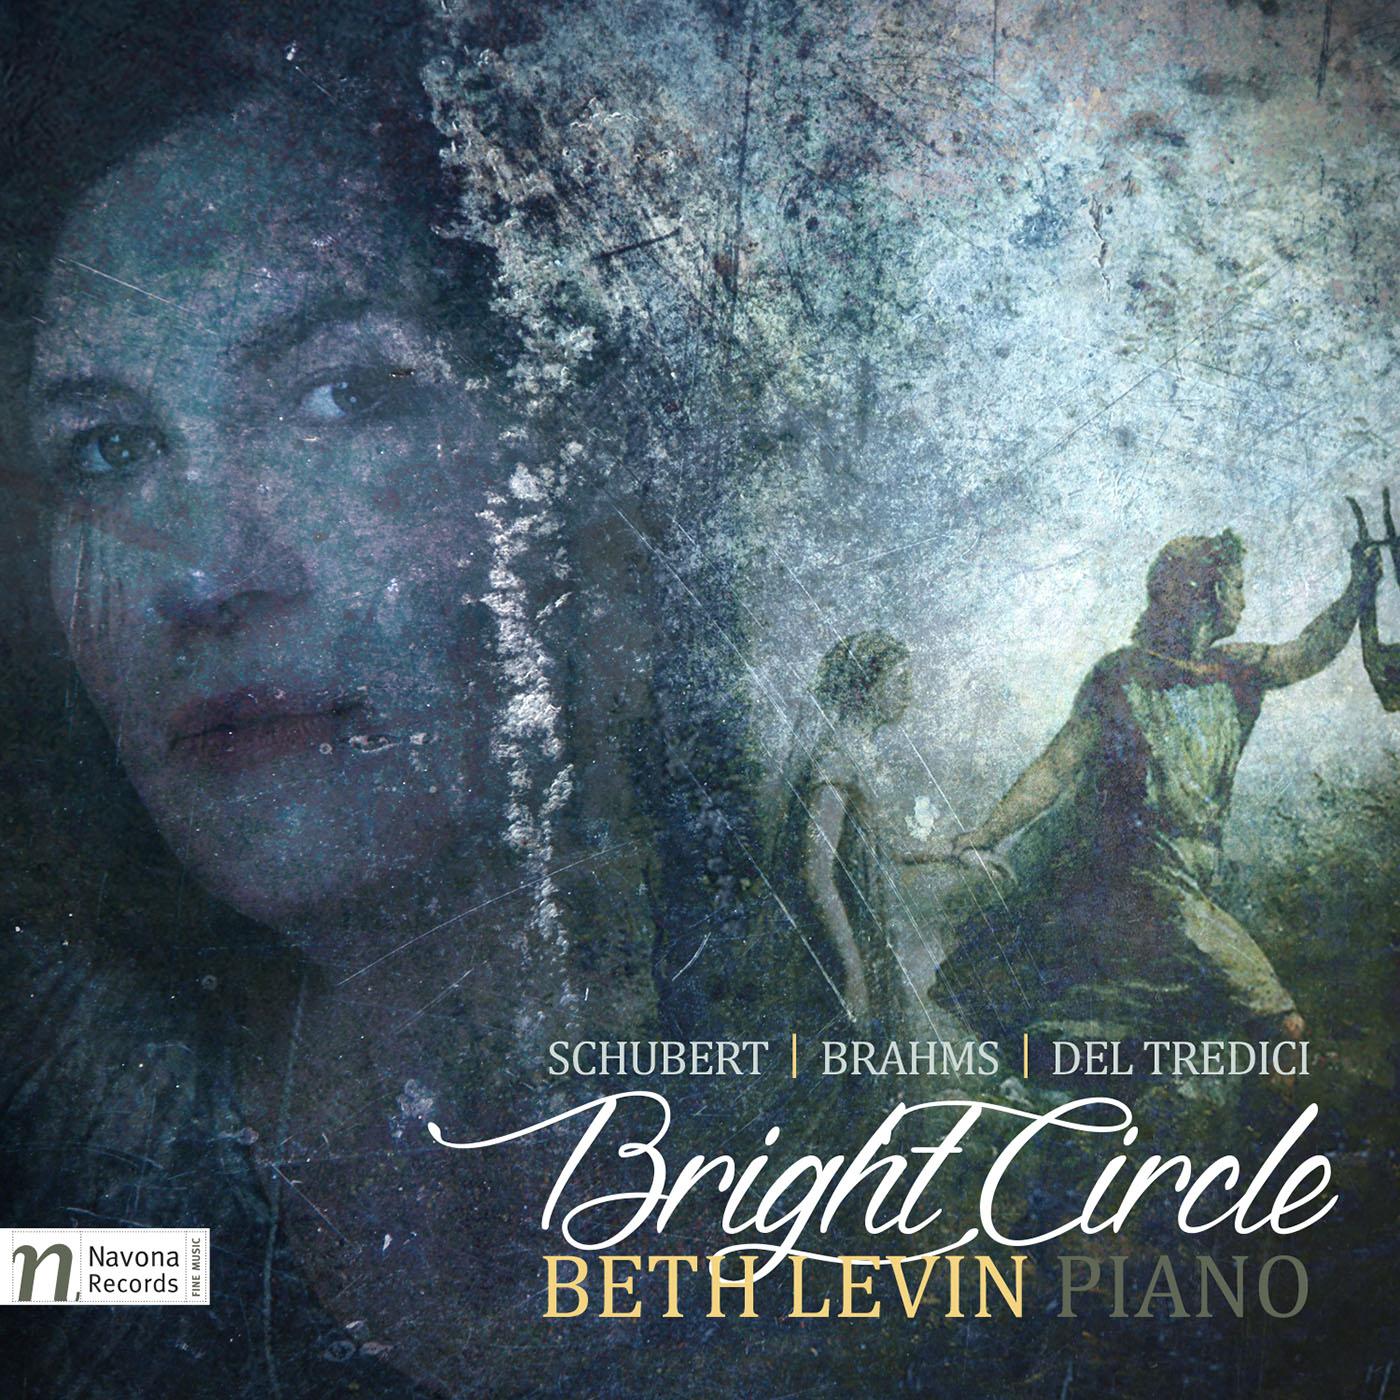 IN REVIEW: Franz Schubert, Johannes Brahms, & David Del Tredici - BRIGHT CIRCILE (Navona Records NV6074)